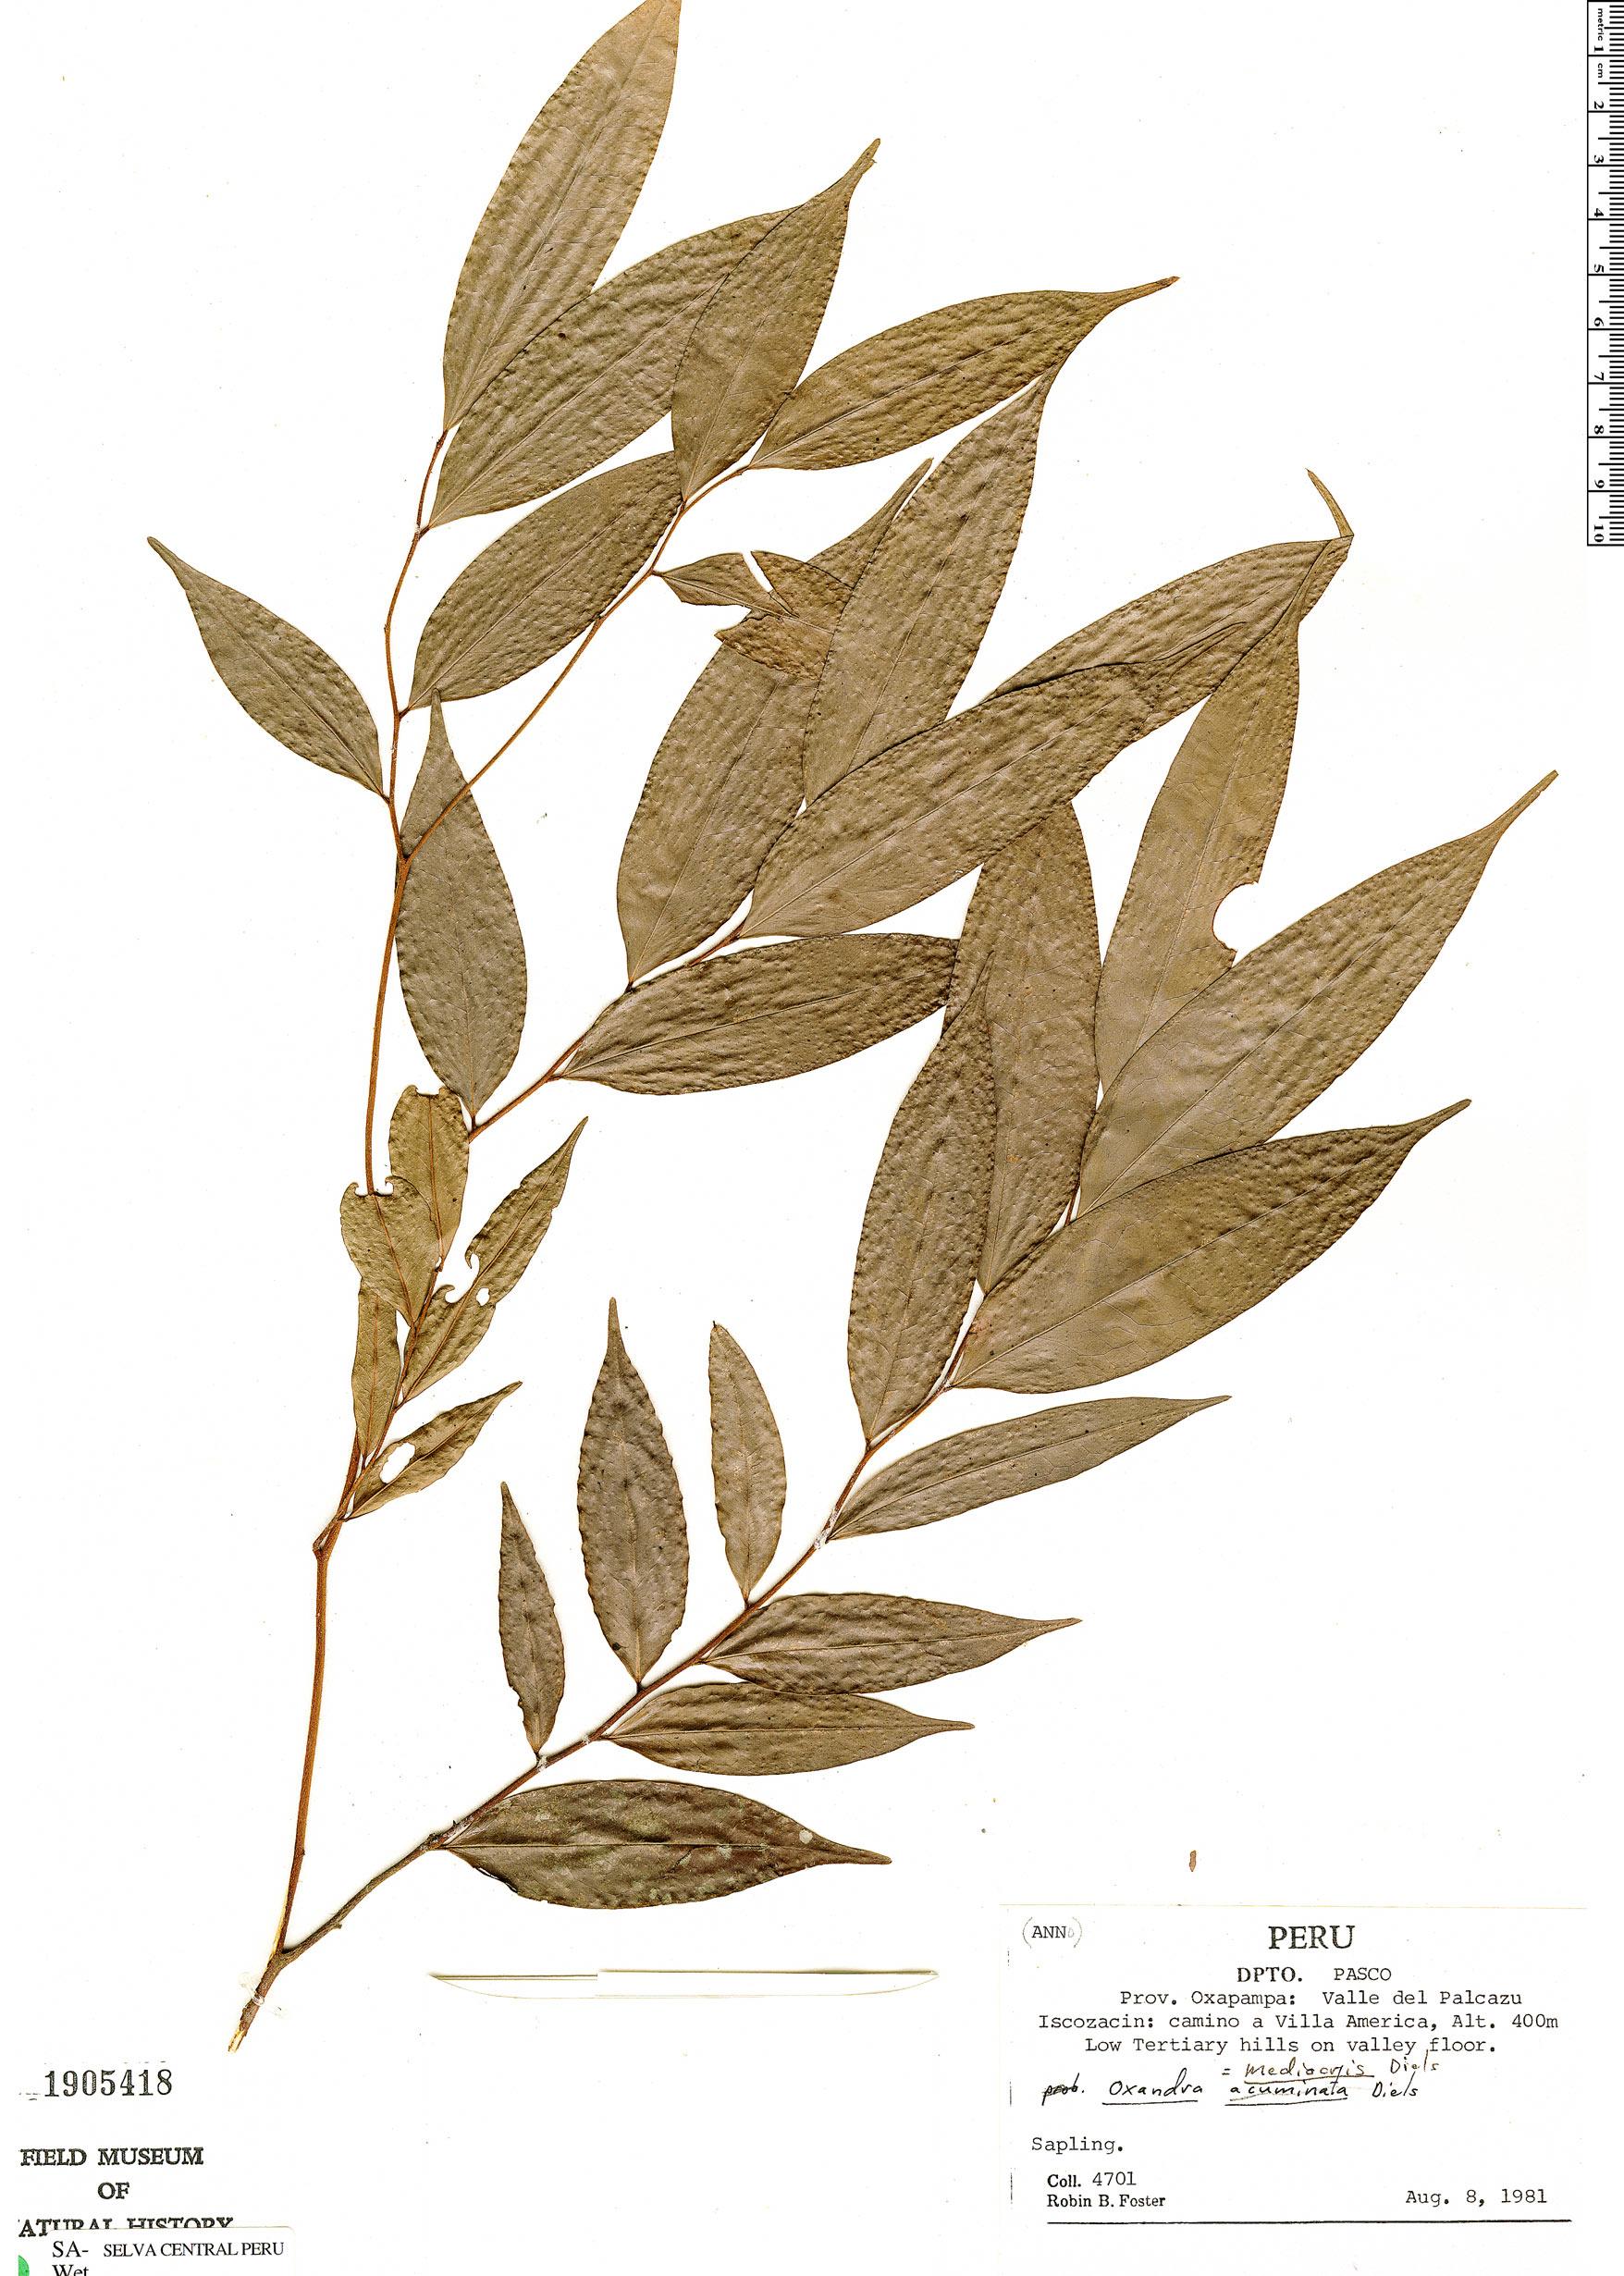 Specimen: Oxandra sphaerocarpa